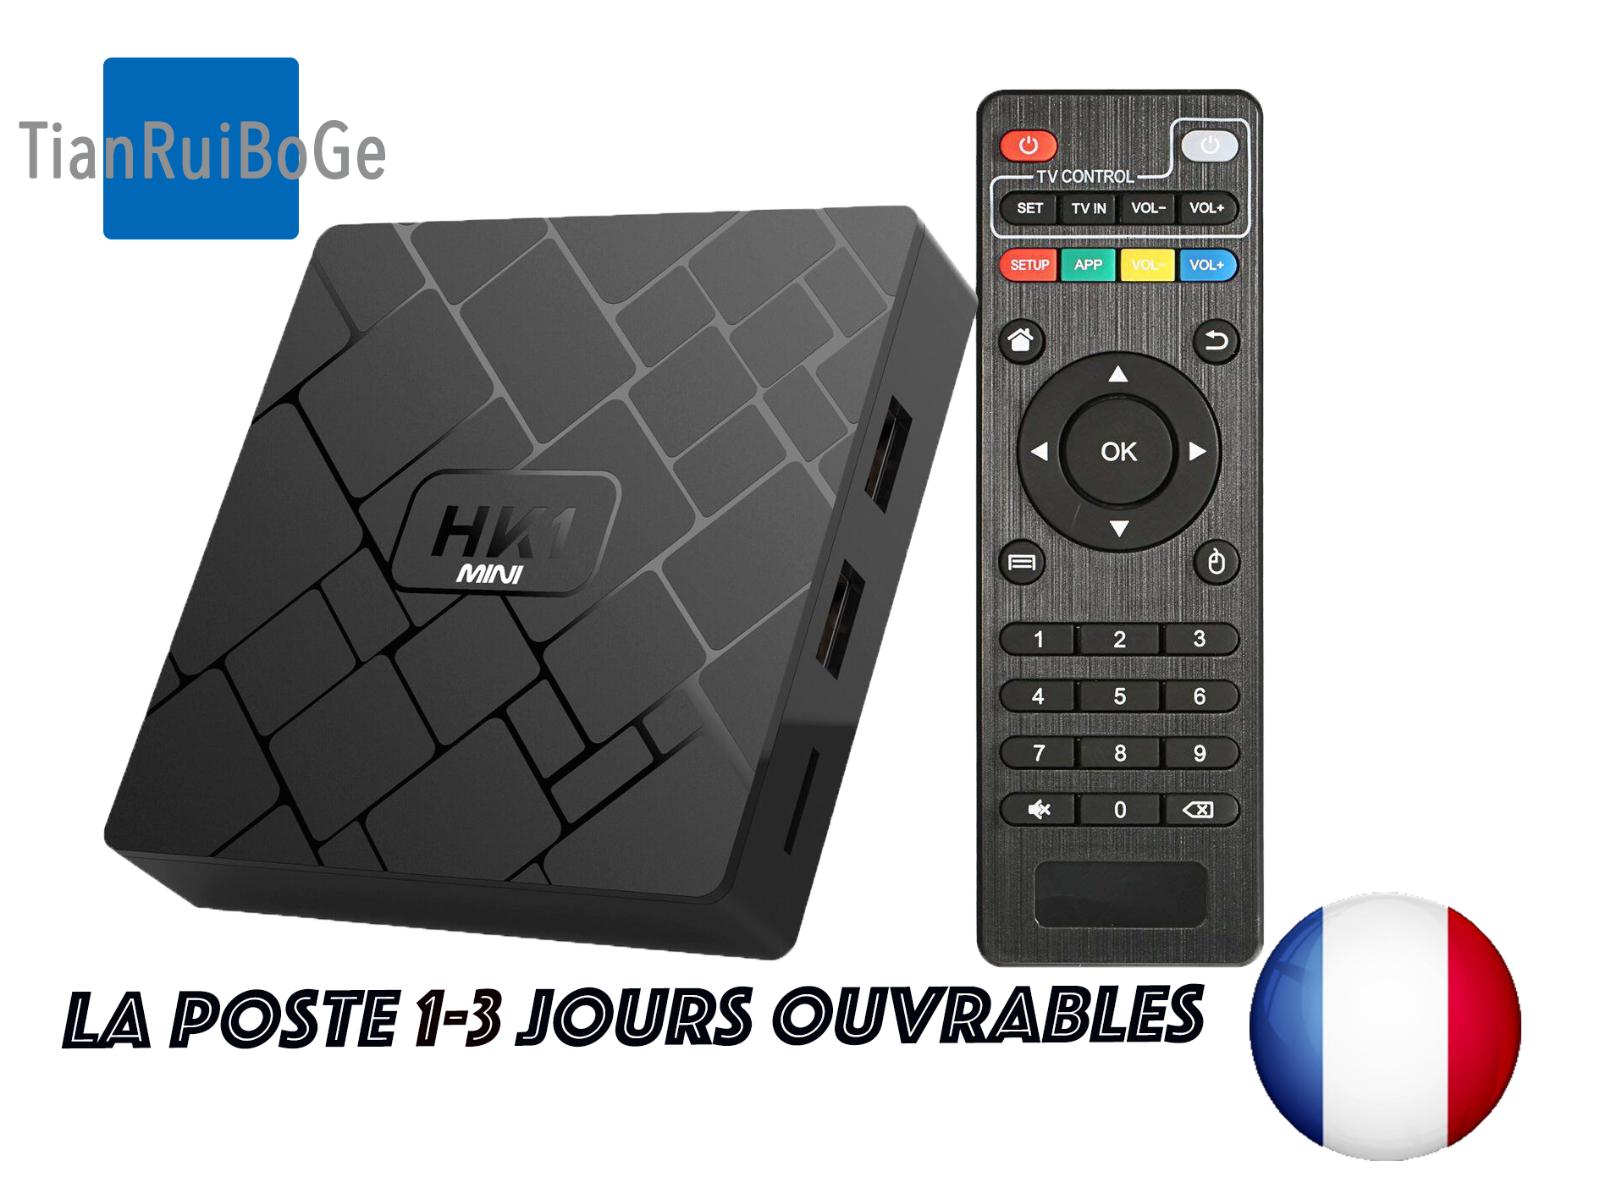 hk1mini android 8.1 2gb+16gb wifi 2.4g quad core rk3329 smart tv box